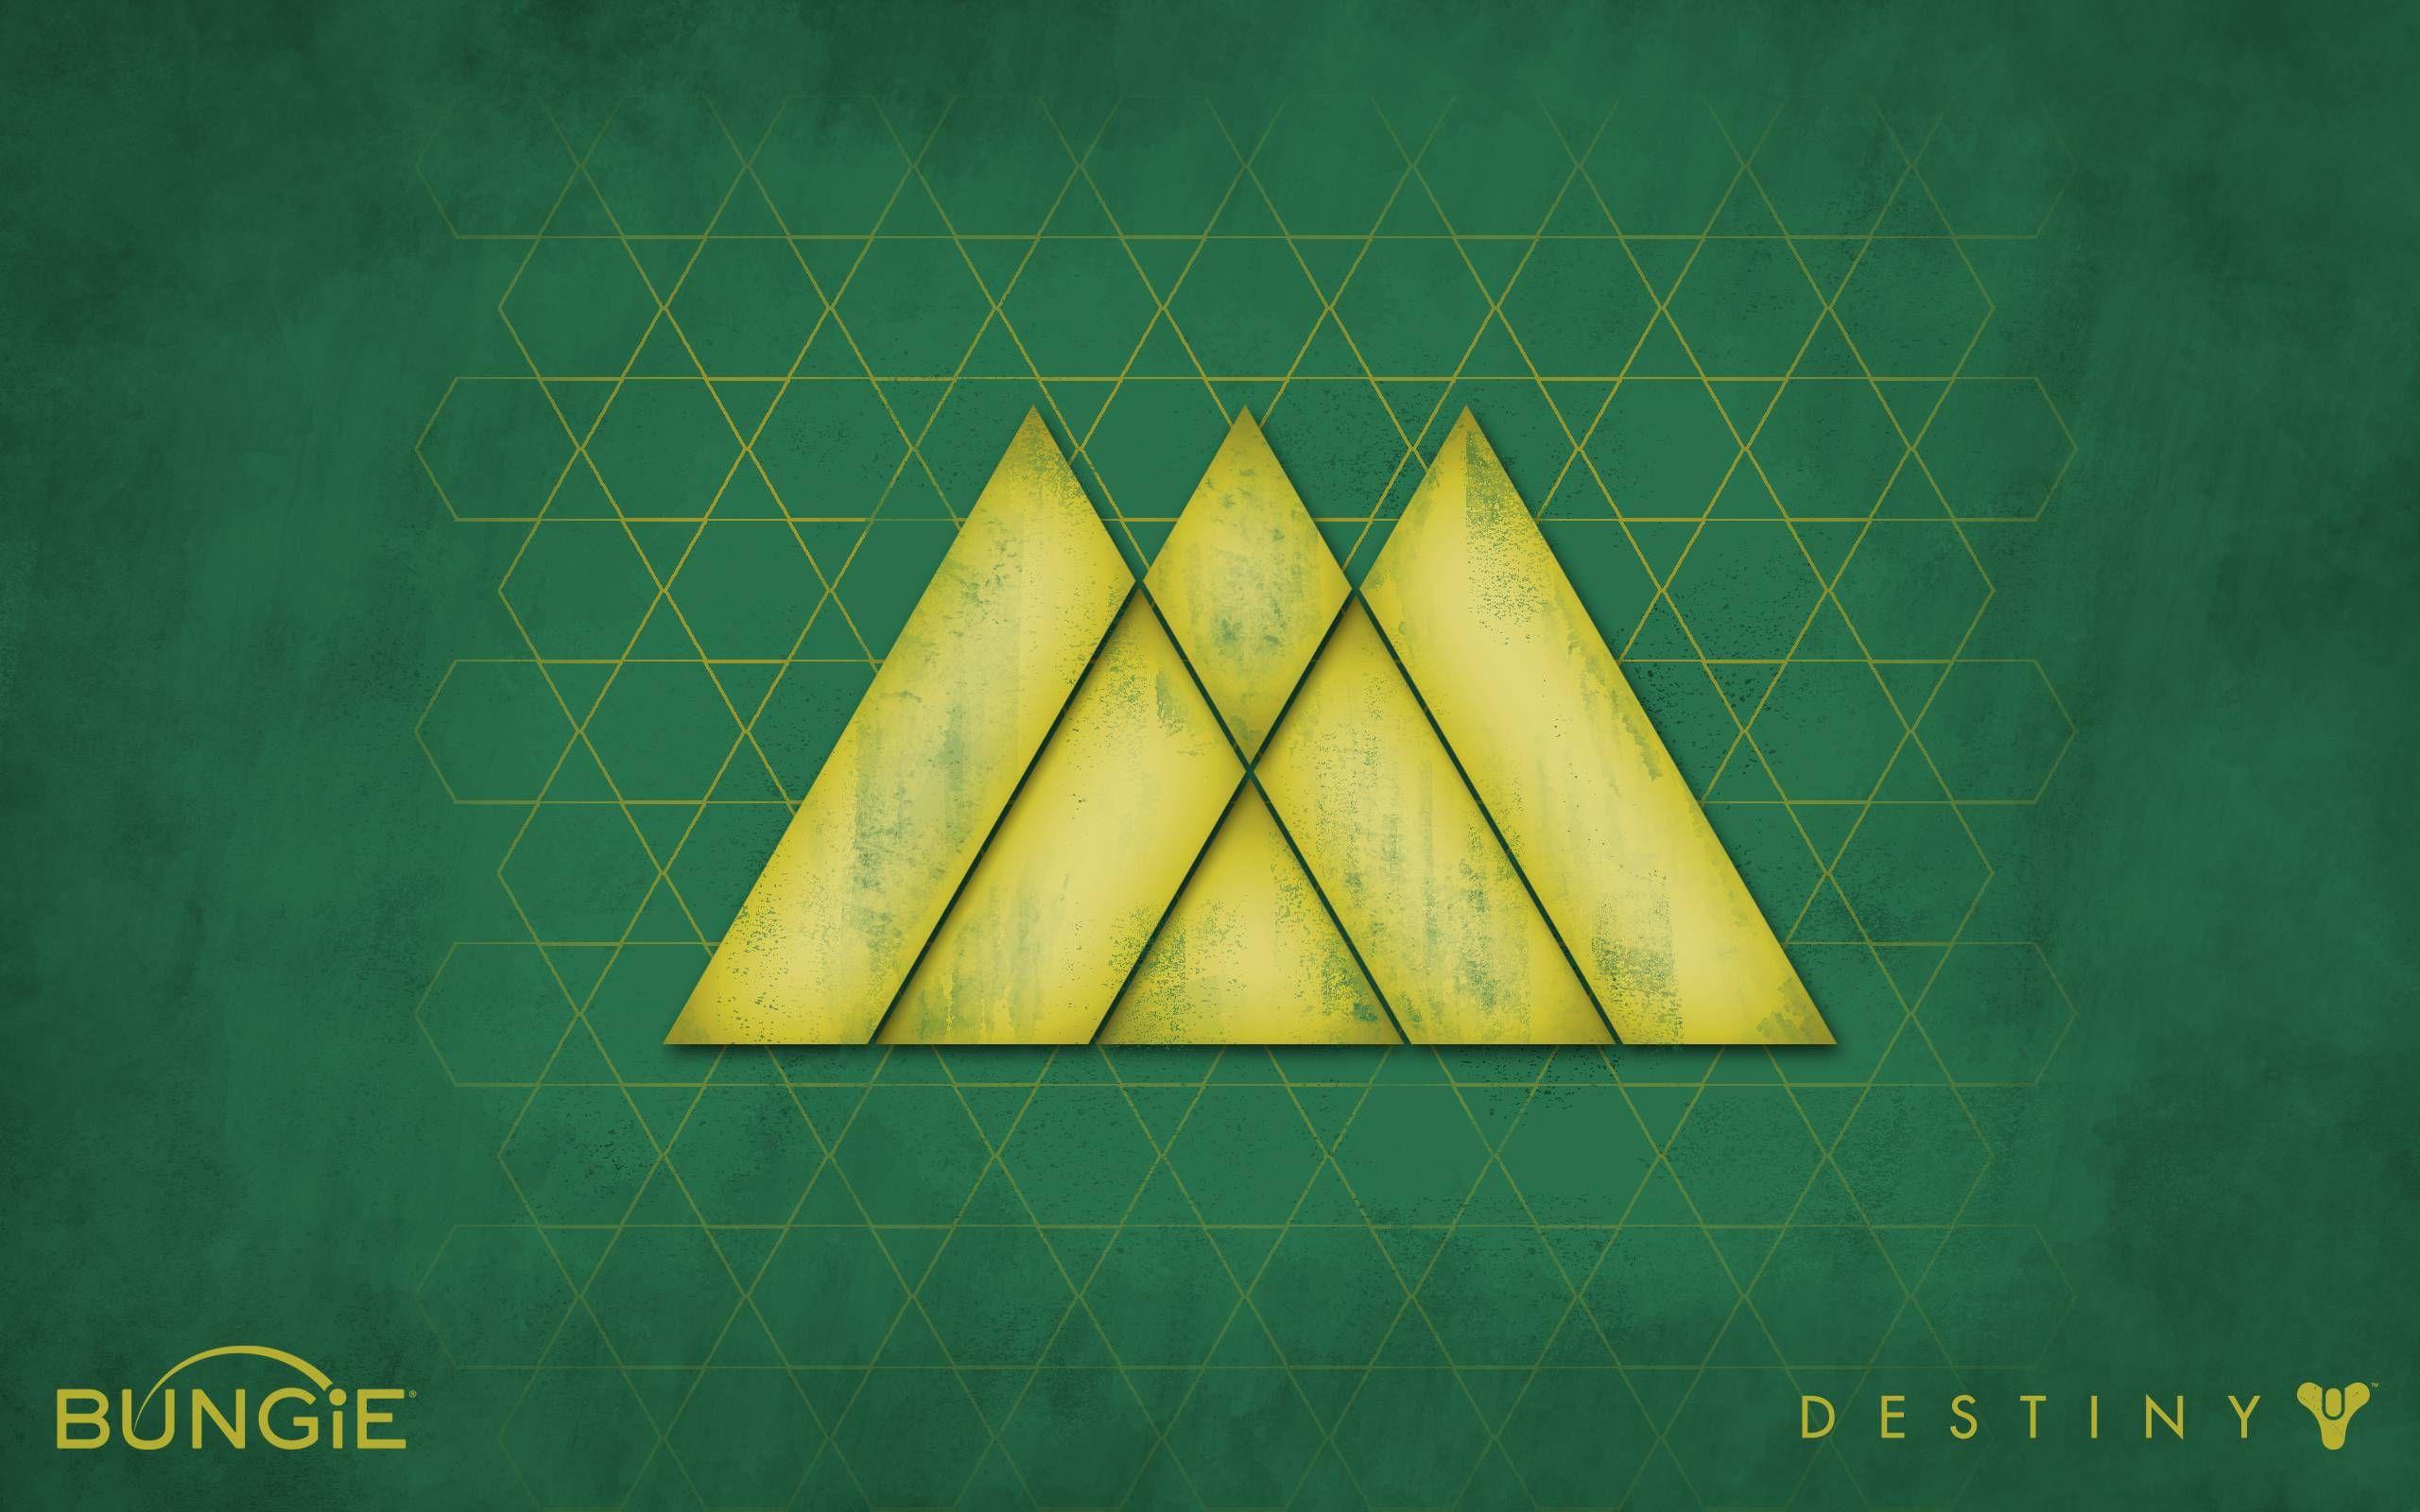 Destiny warlock symbol hd wallpaper destiny jackets pinterest destiny warlock symbol hd wallpaper biocorpaavc Gallery